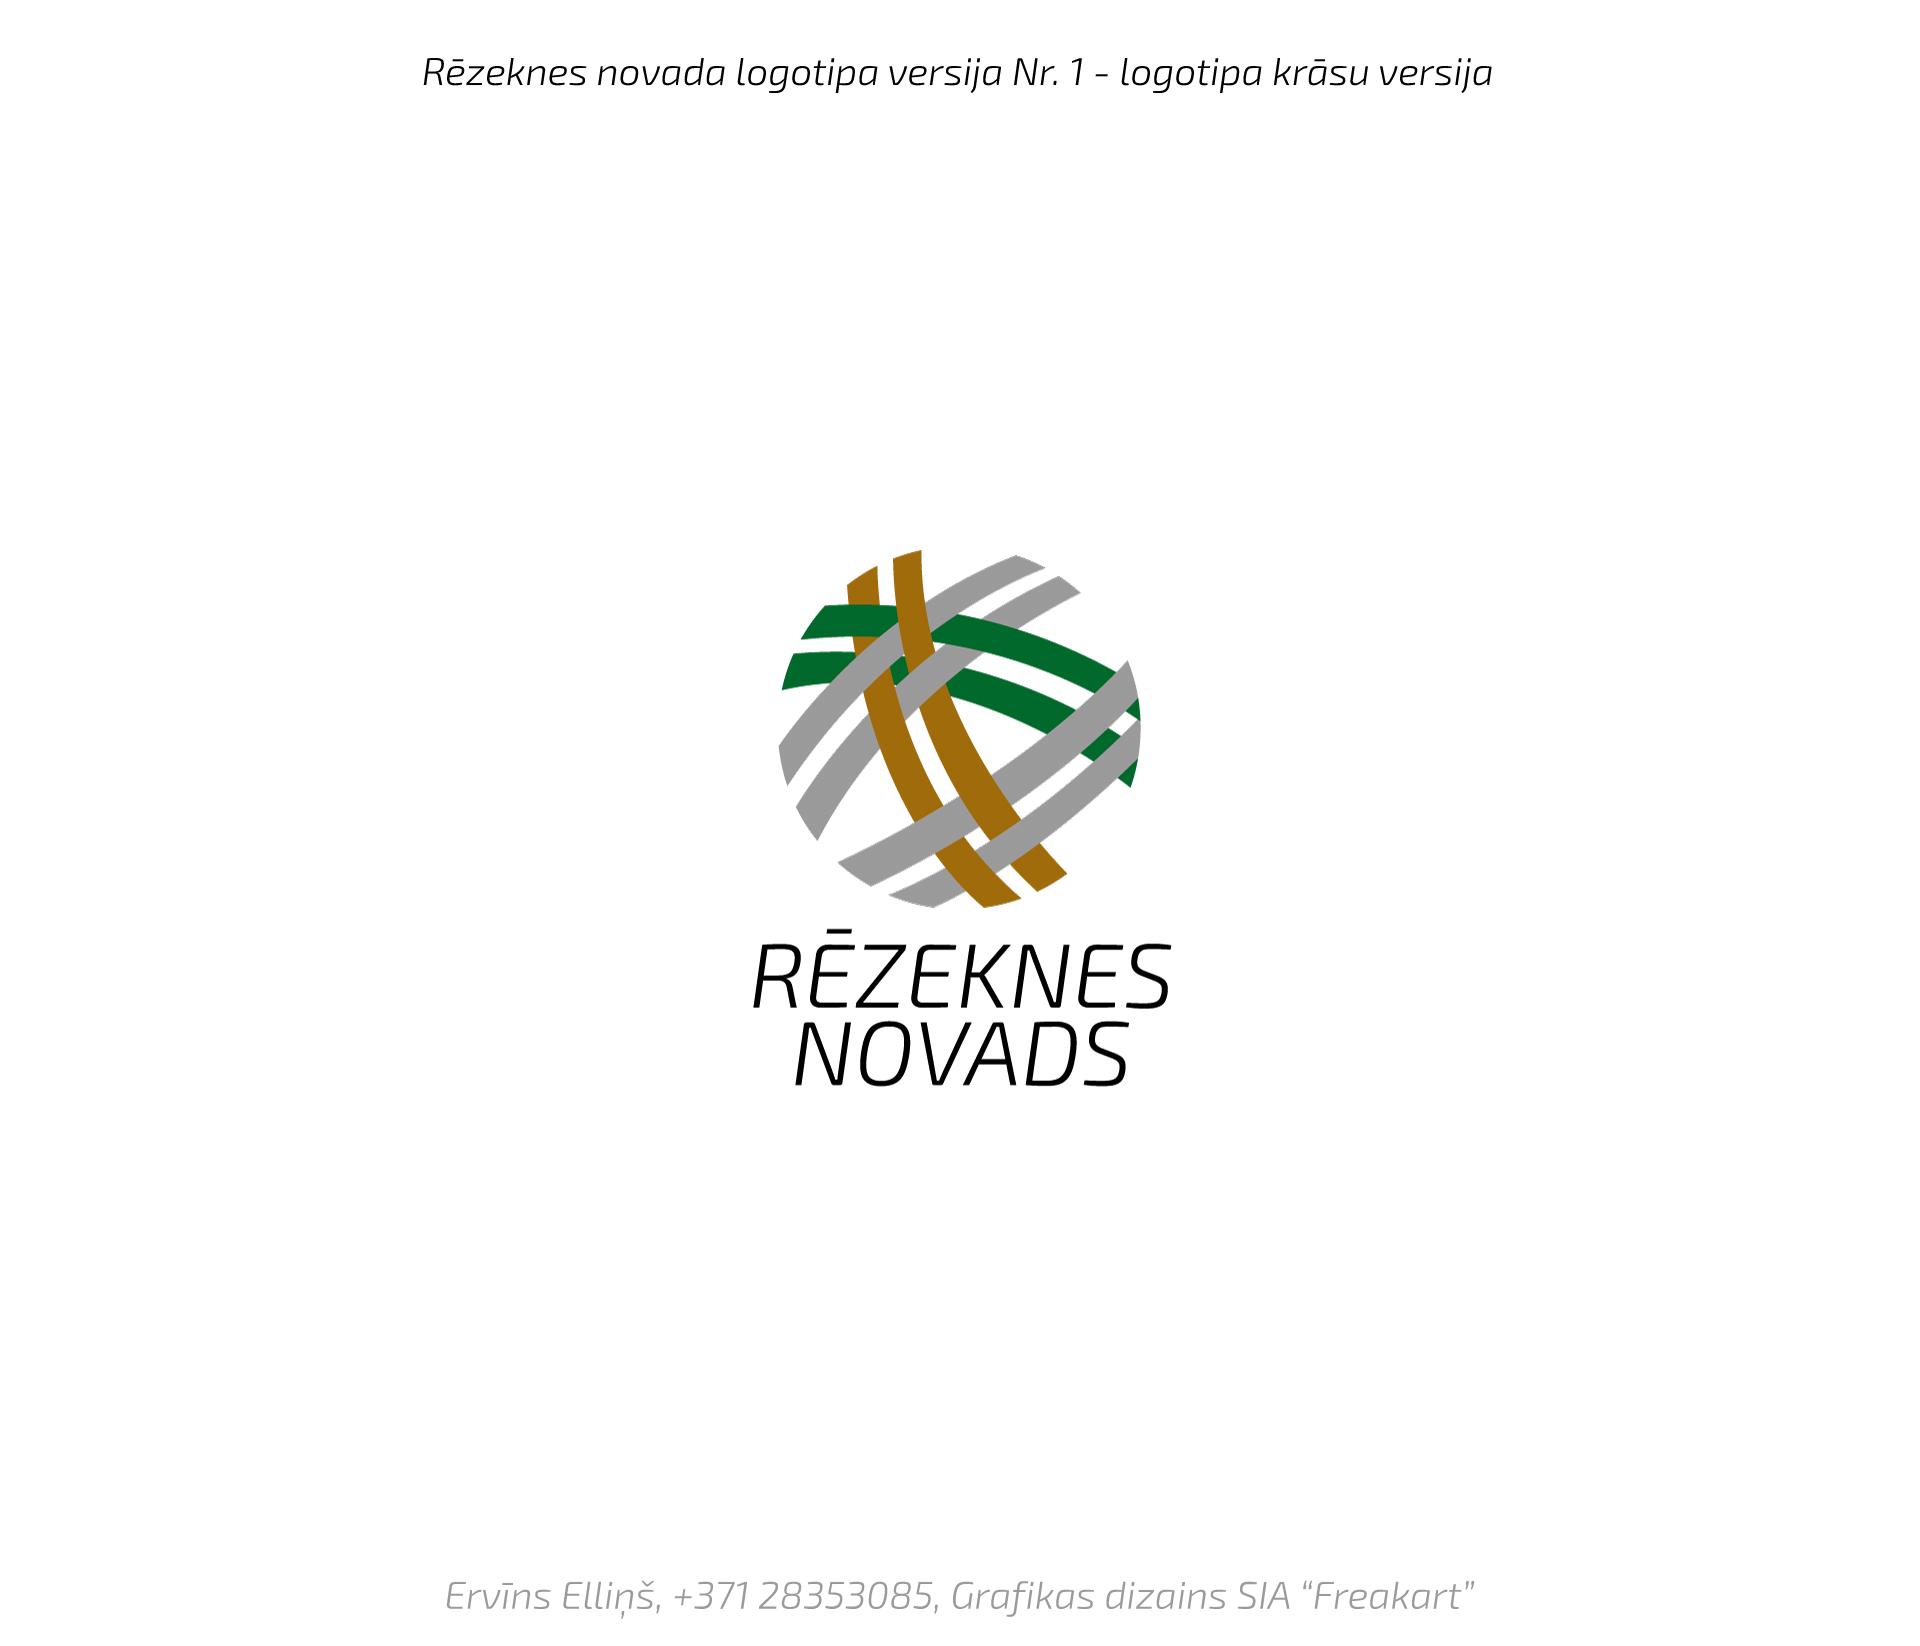 logotipa dizaina izstrāde, logo dizains, Разработка дизайна логотипа, logotype design development